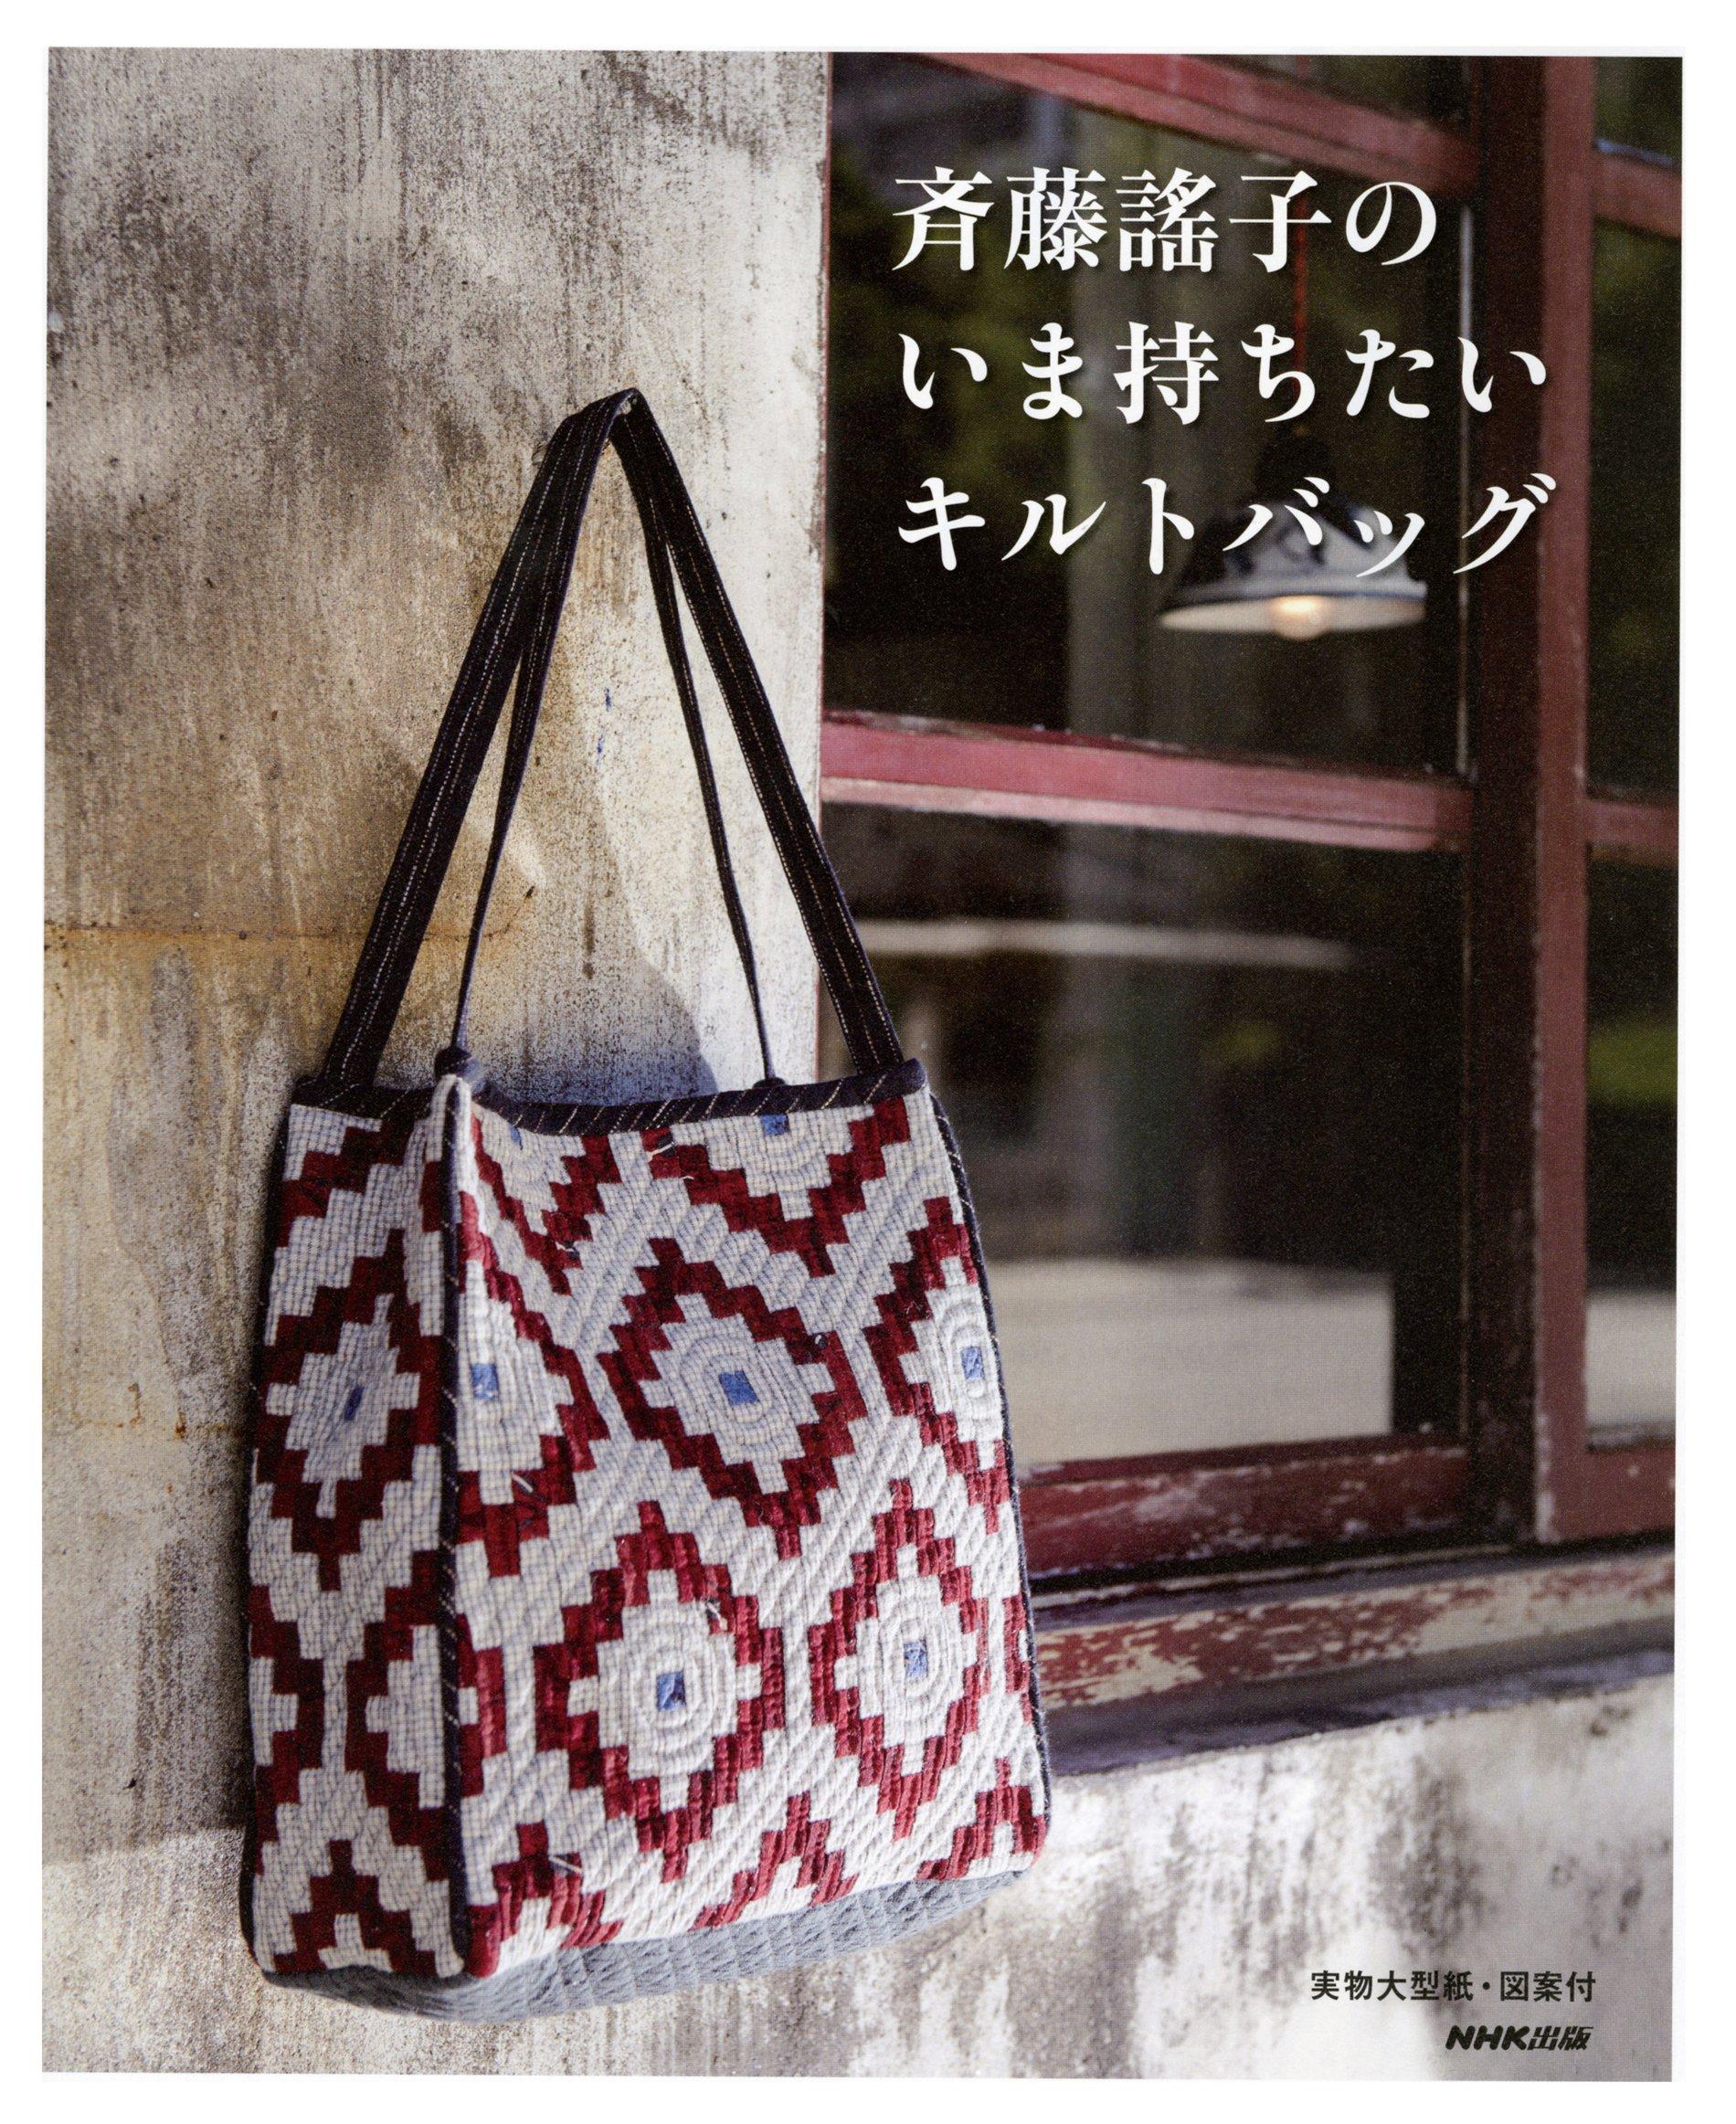 Quilt bag of Yoko Saito